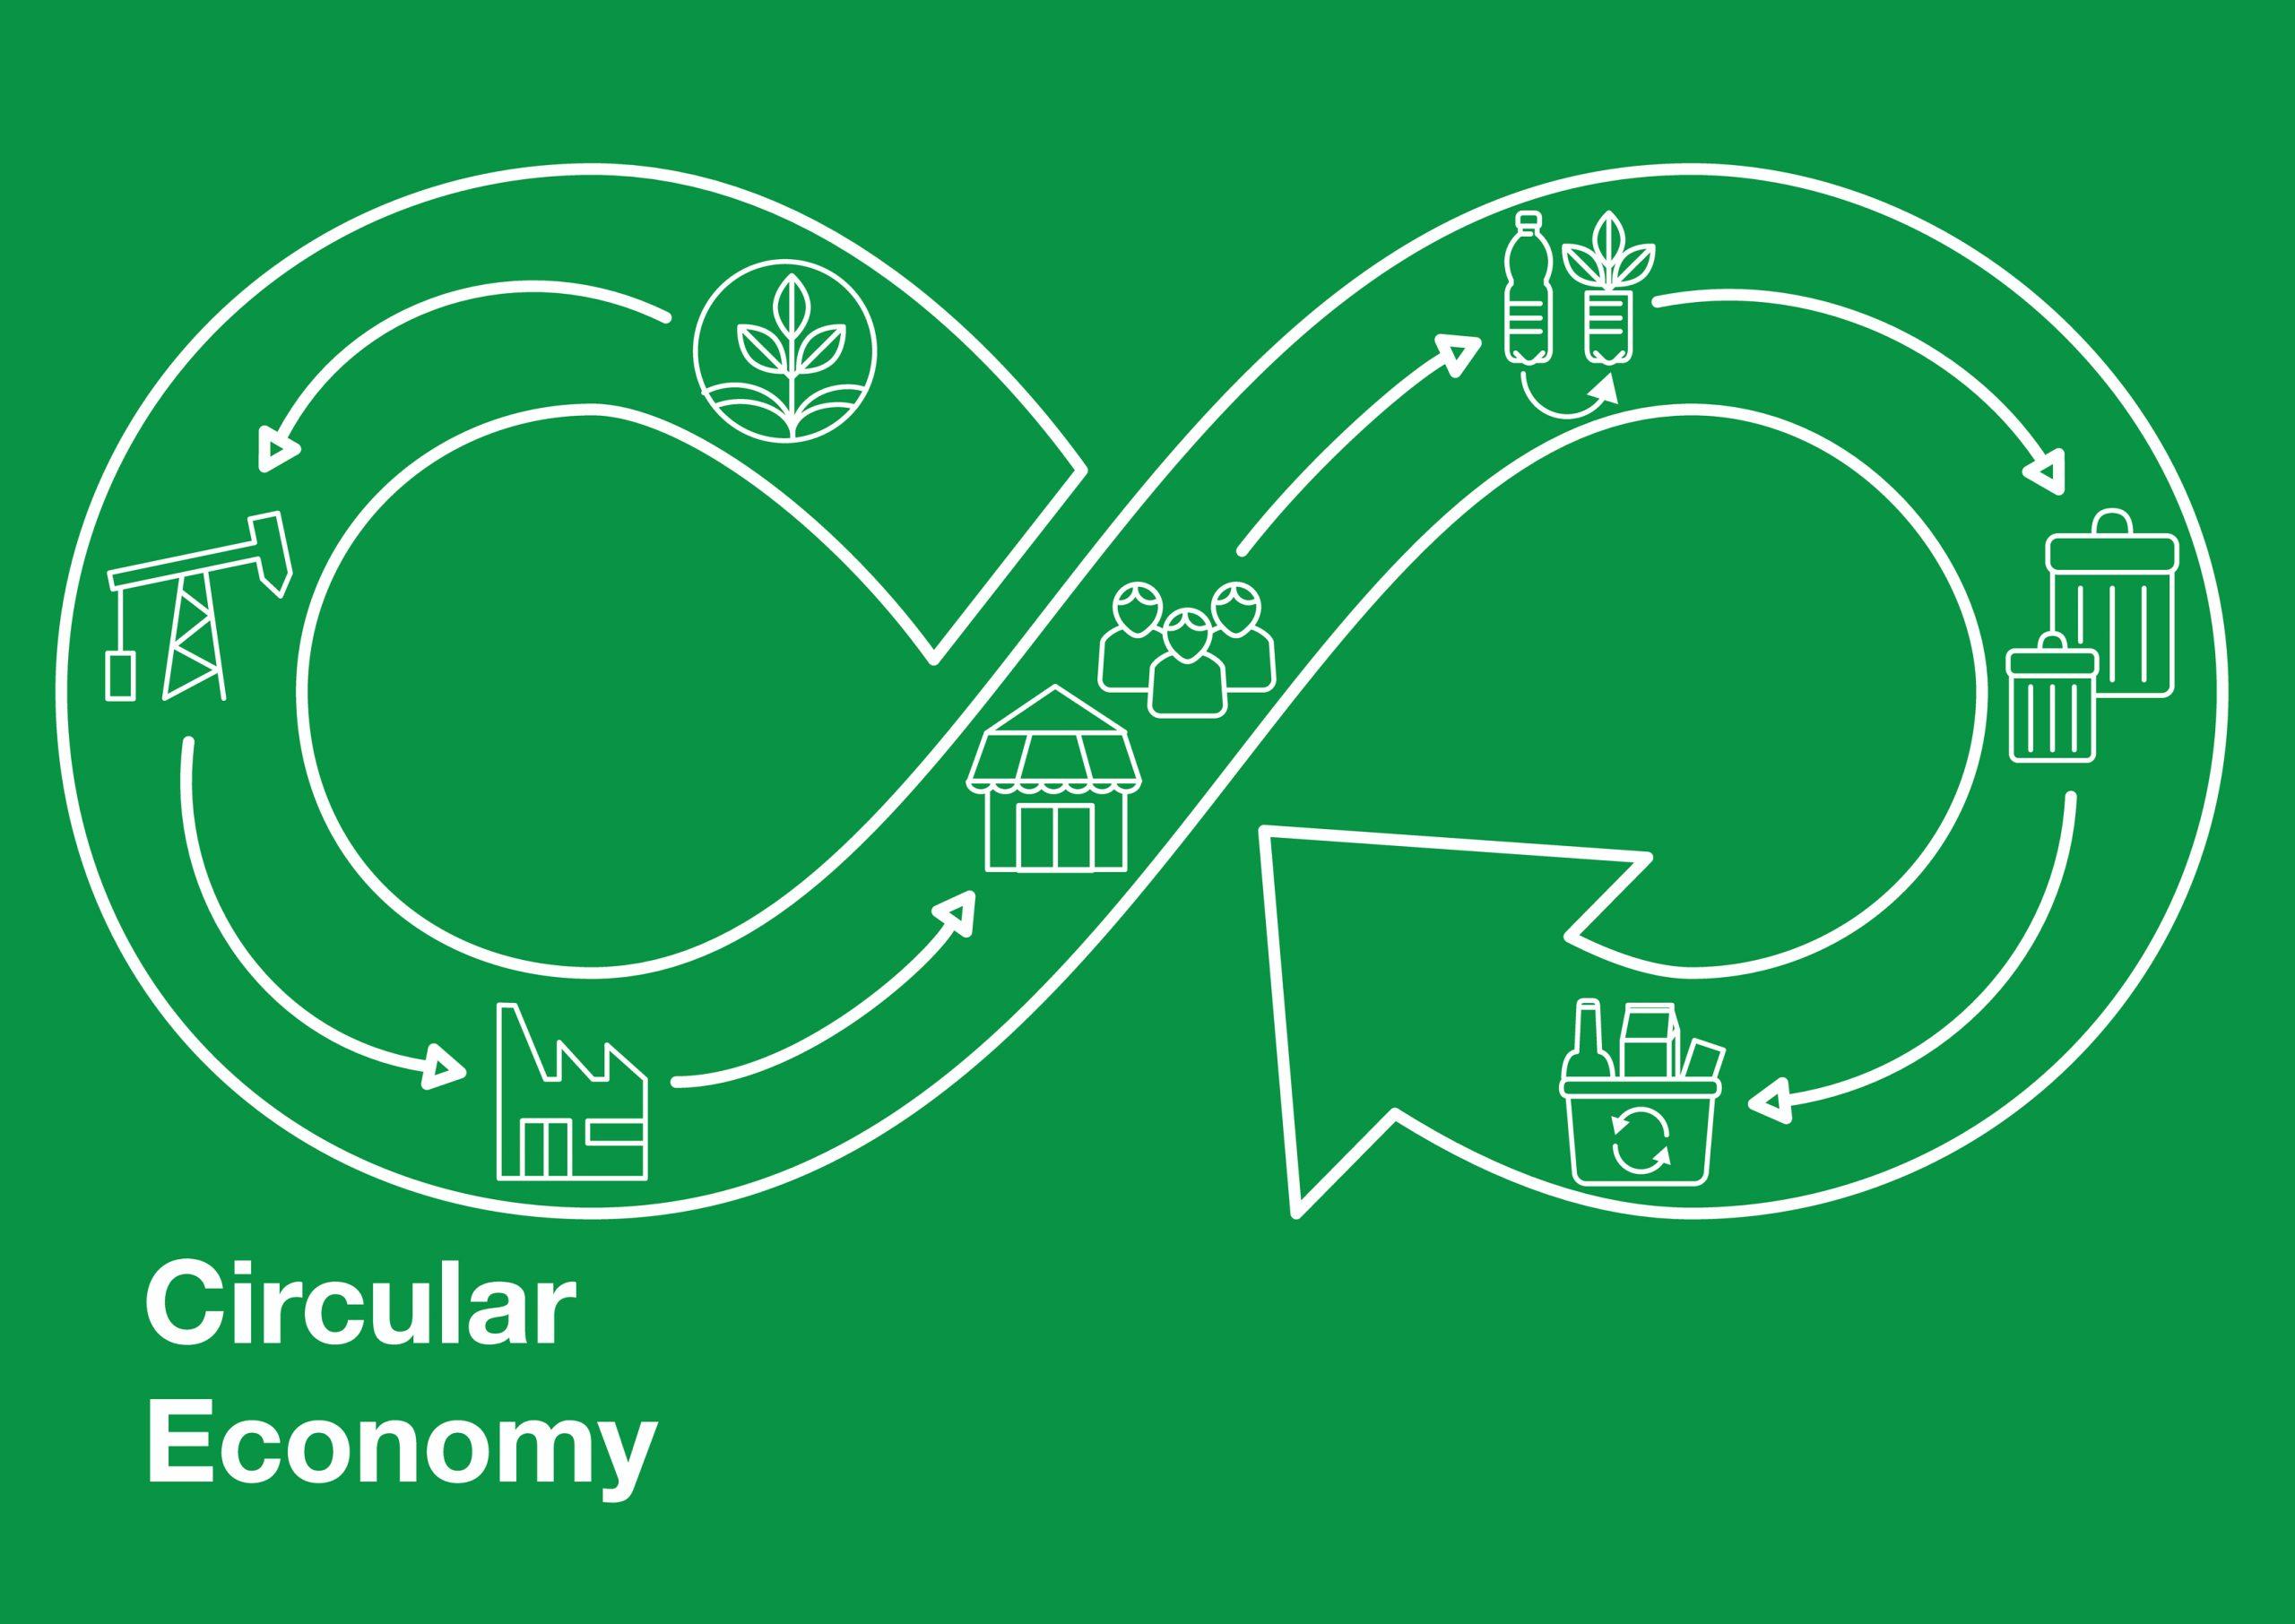 What isthe circular economy?